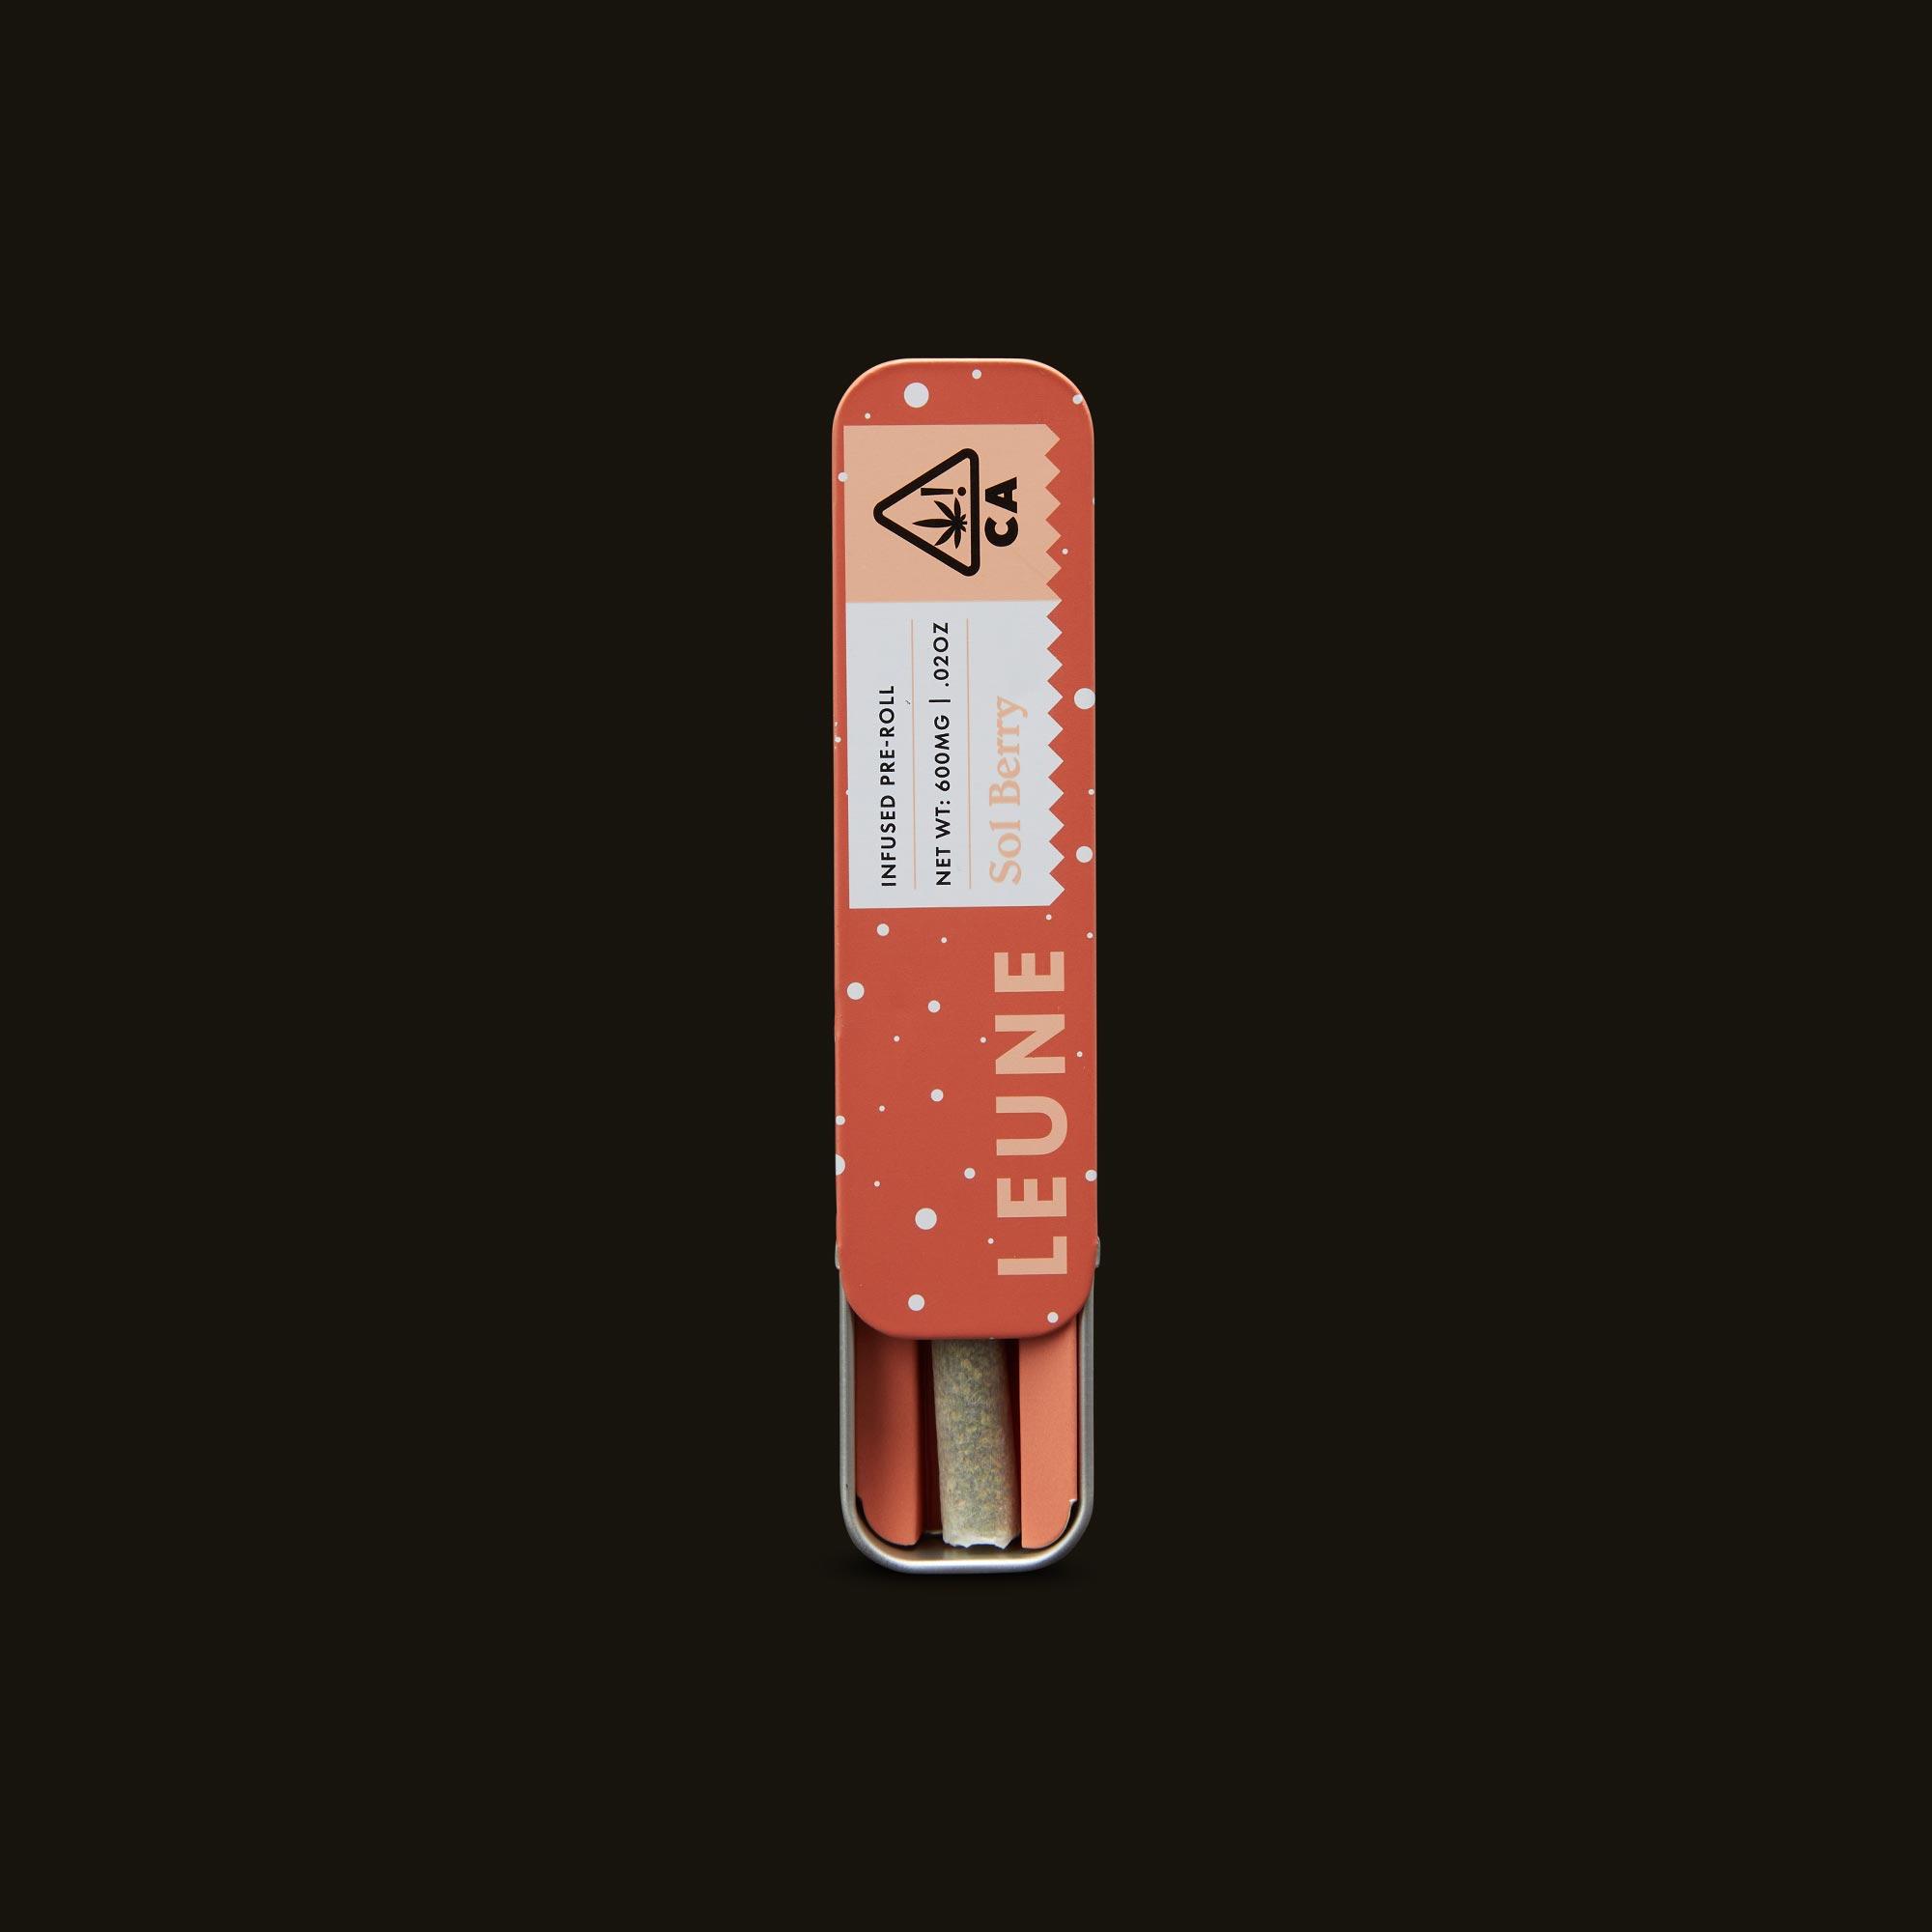 LEUNE Sol Berry Pre-Roll Open Packaging